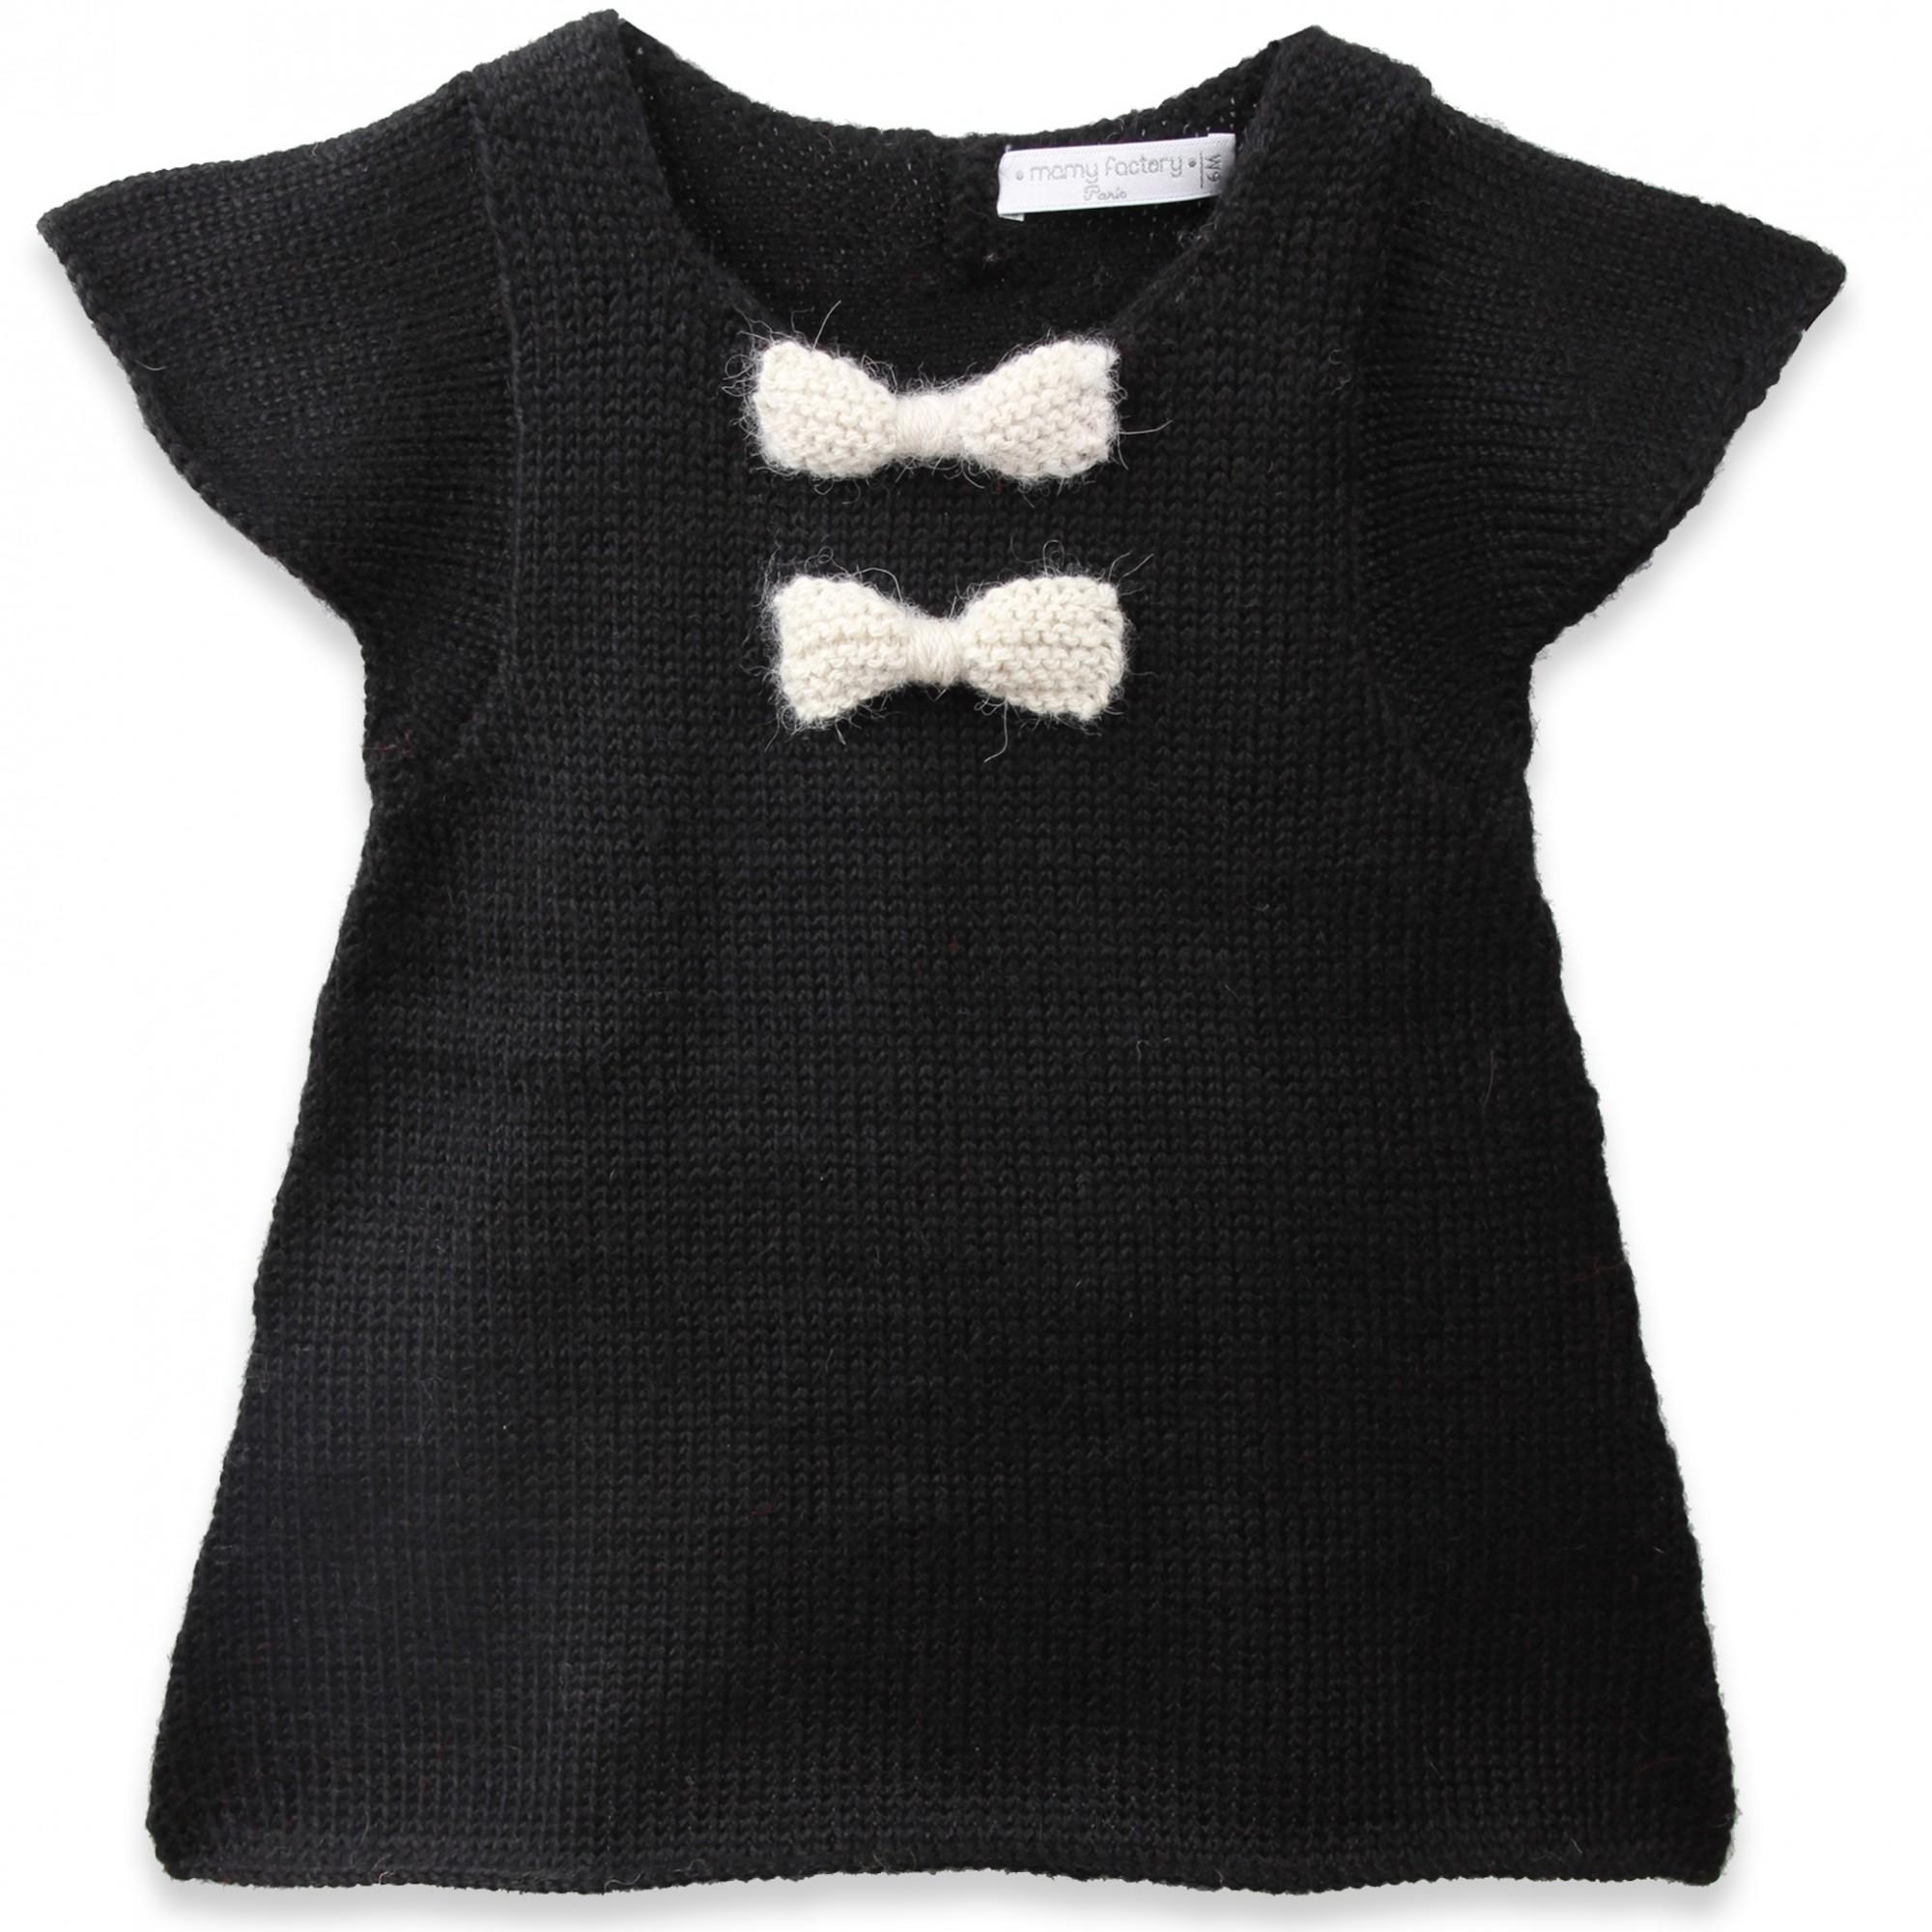 Granny s knitwear Black dress for baby girls short sleeves